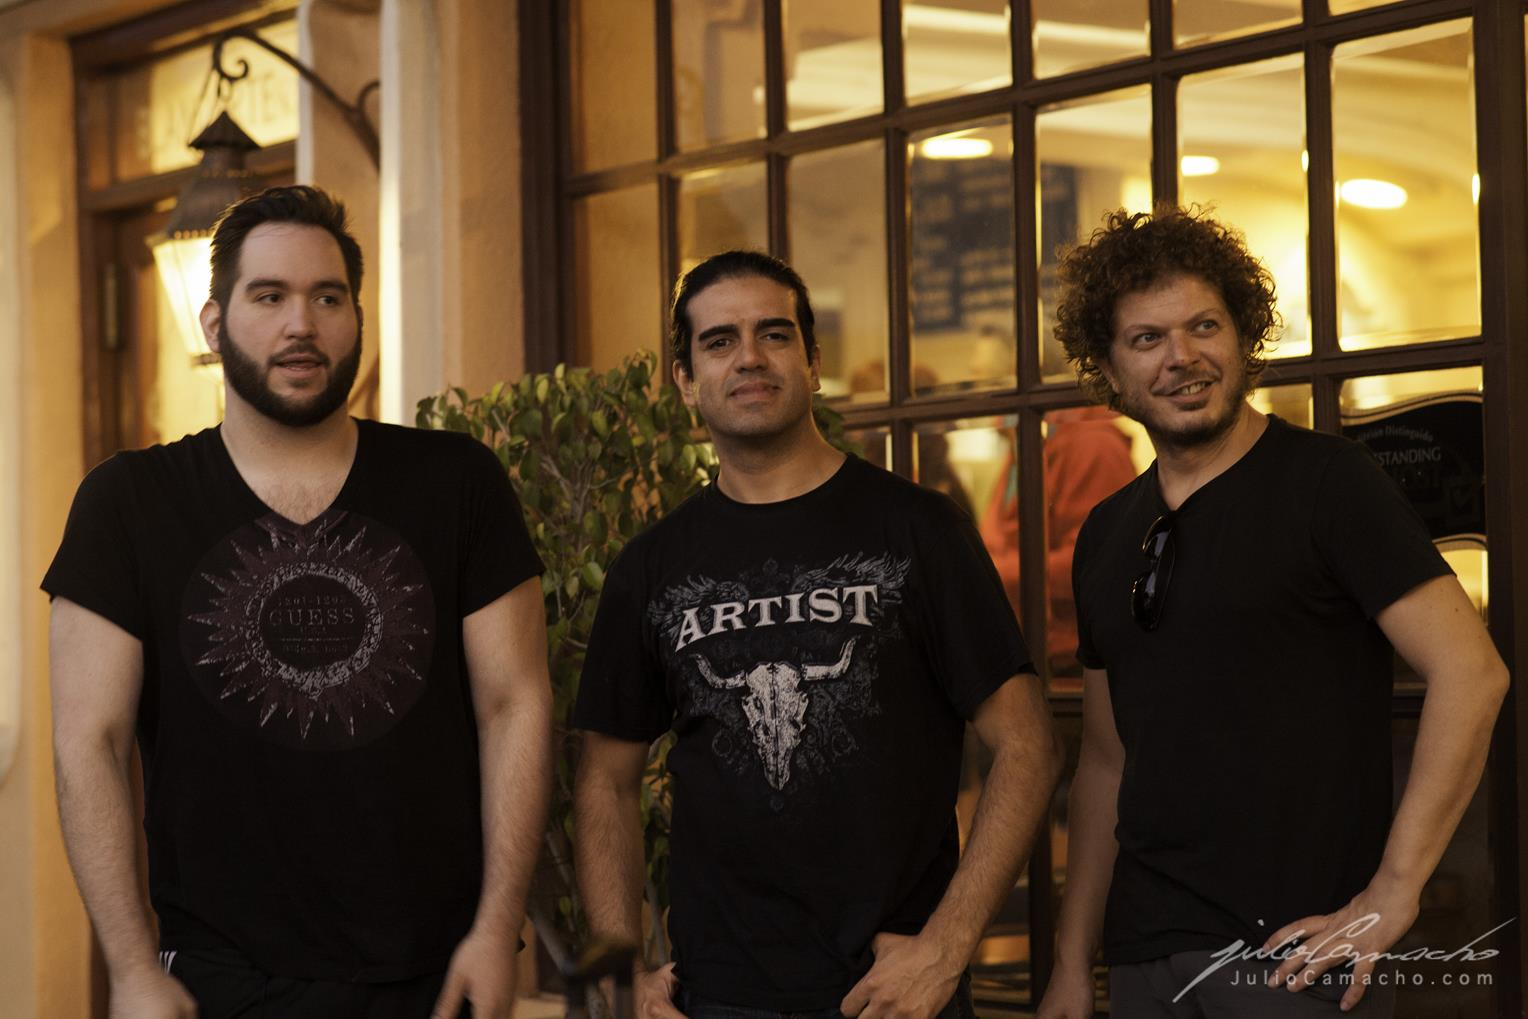 2014-10-30 31 CAST TOUR Ensenada y Tijuana - 0443 - www.Juli (Copy).jpg